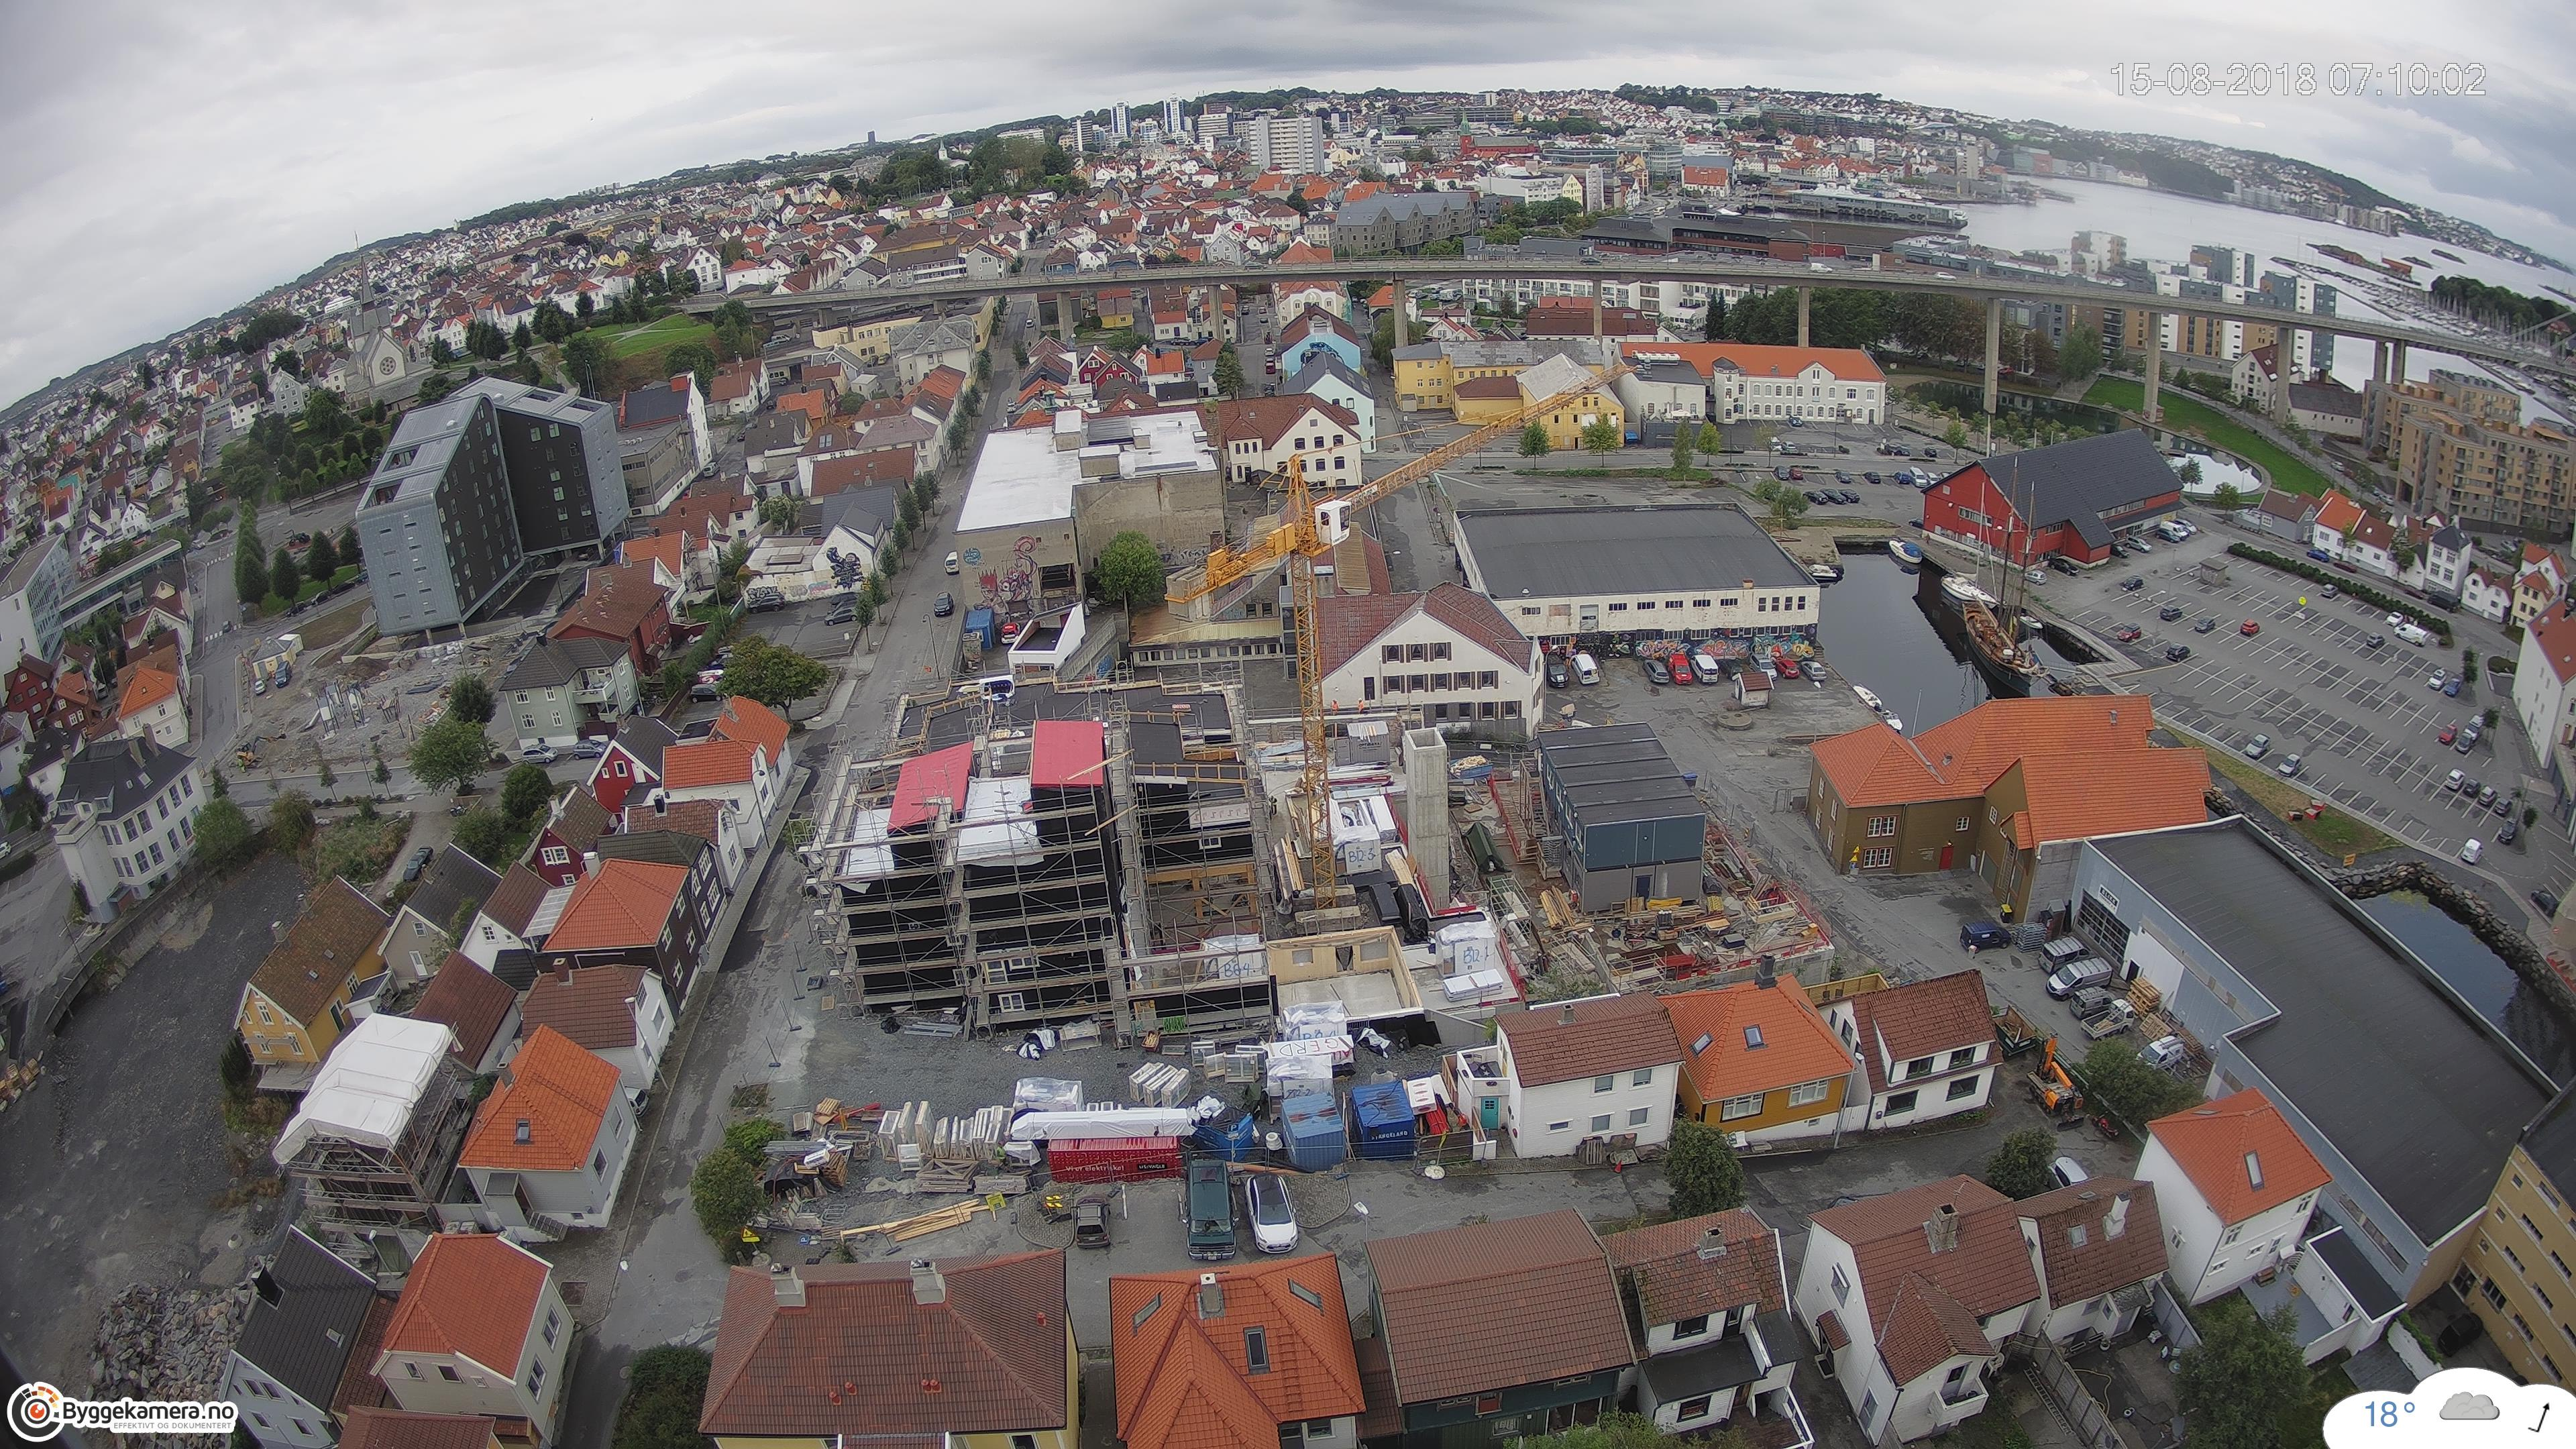 Vindmolleparken Byggekamera timelapse video